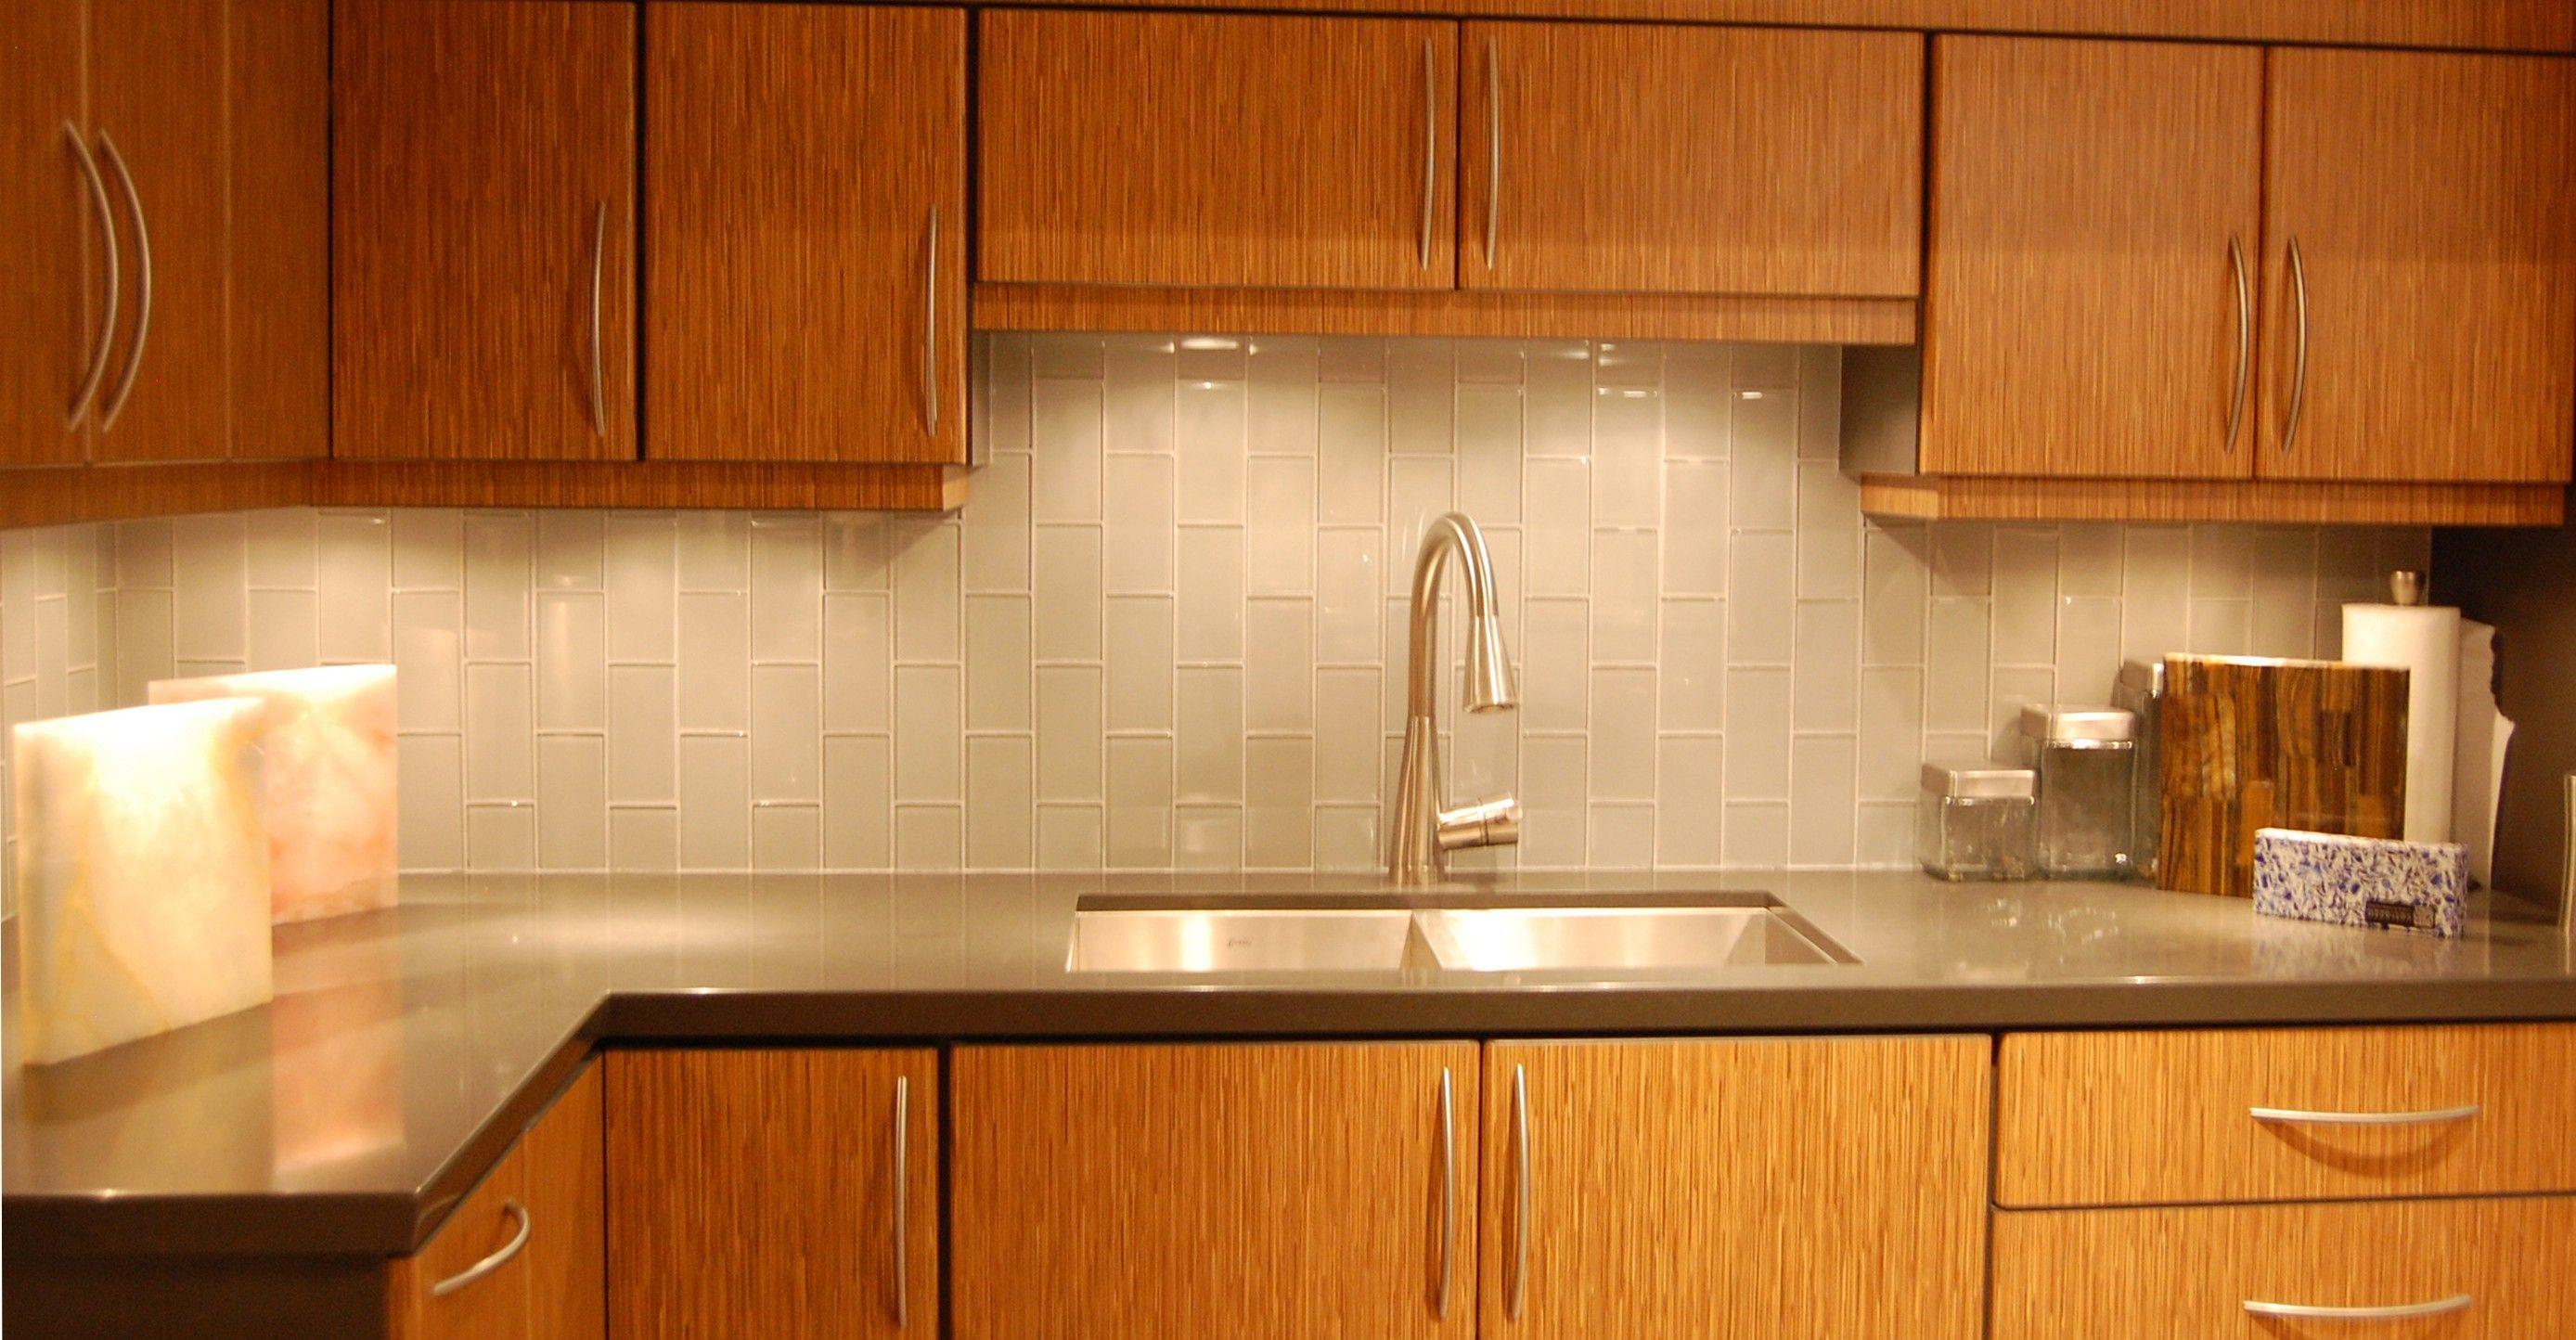 Modern Cream Ceramic Kitchen Wall Tile Backsplash | Lovely Kitchens ...